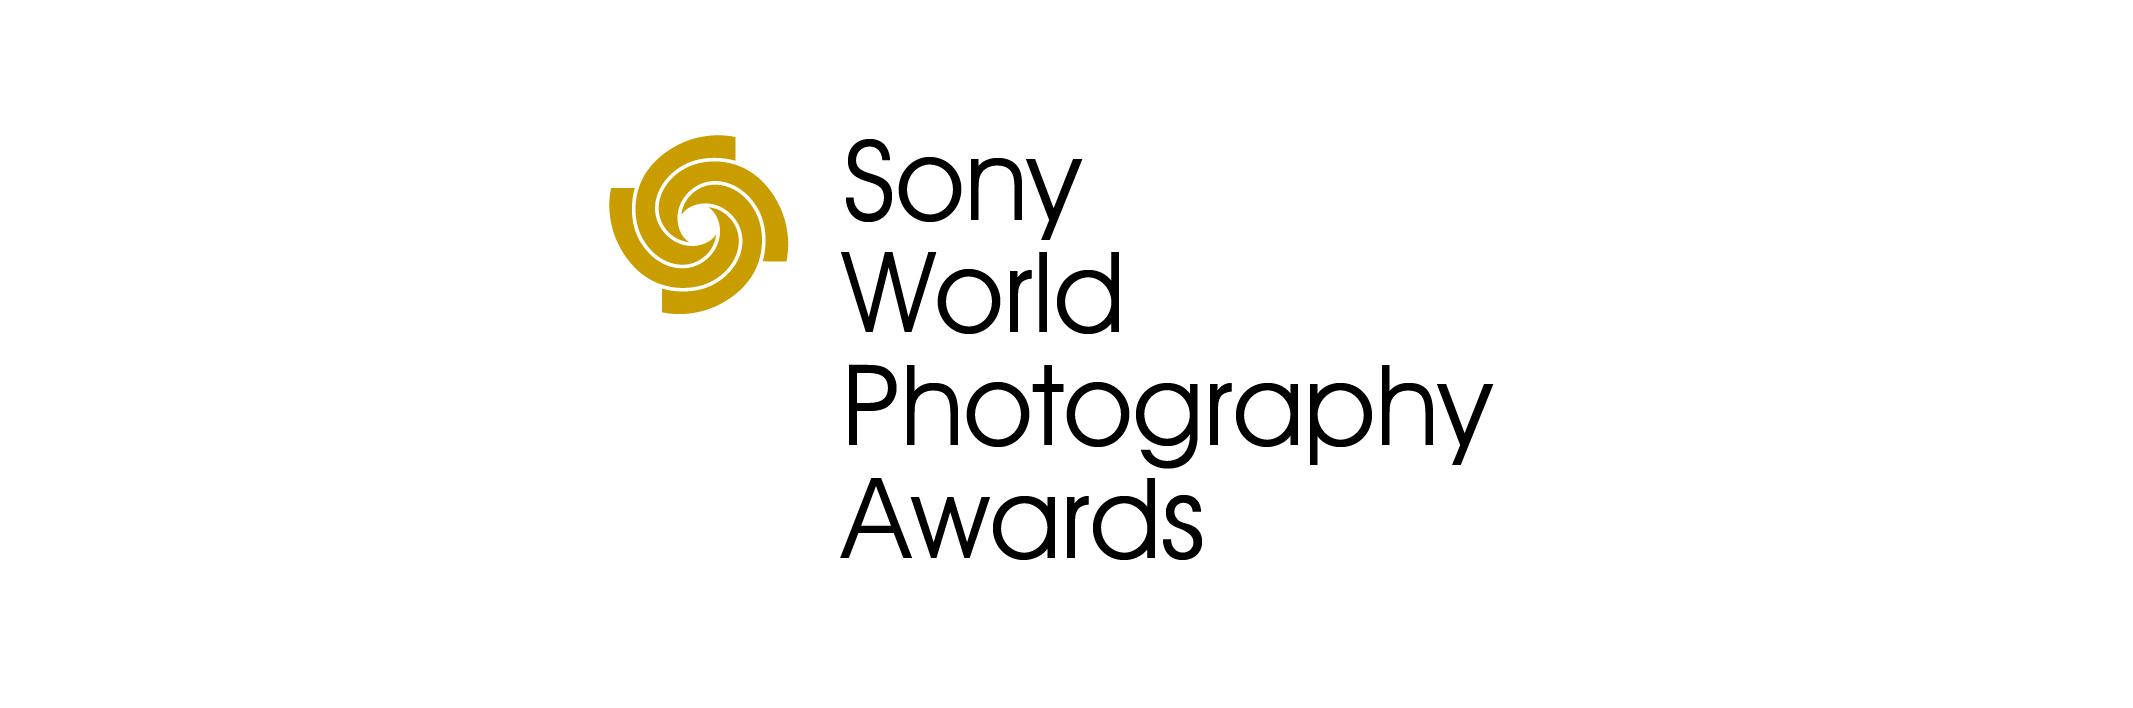 2016 Sony World Photography Awards - logo